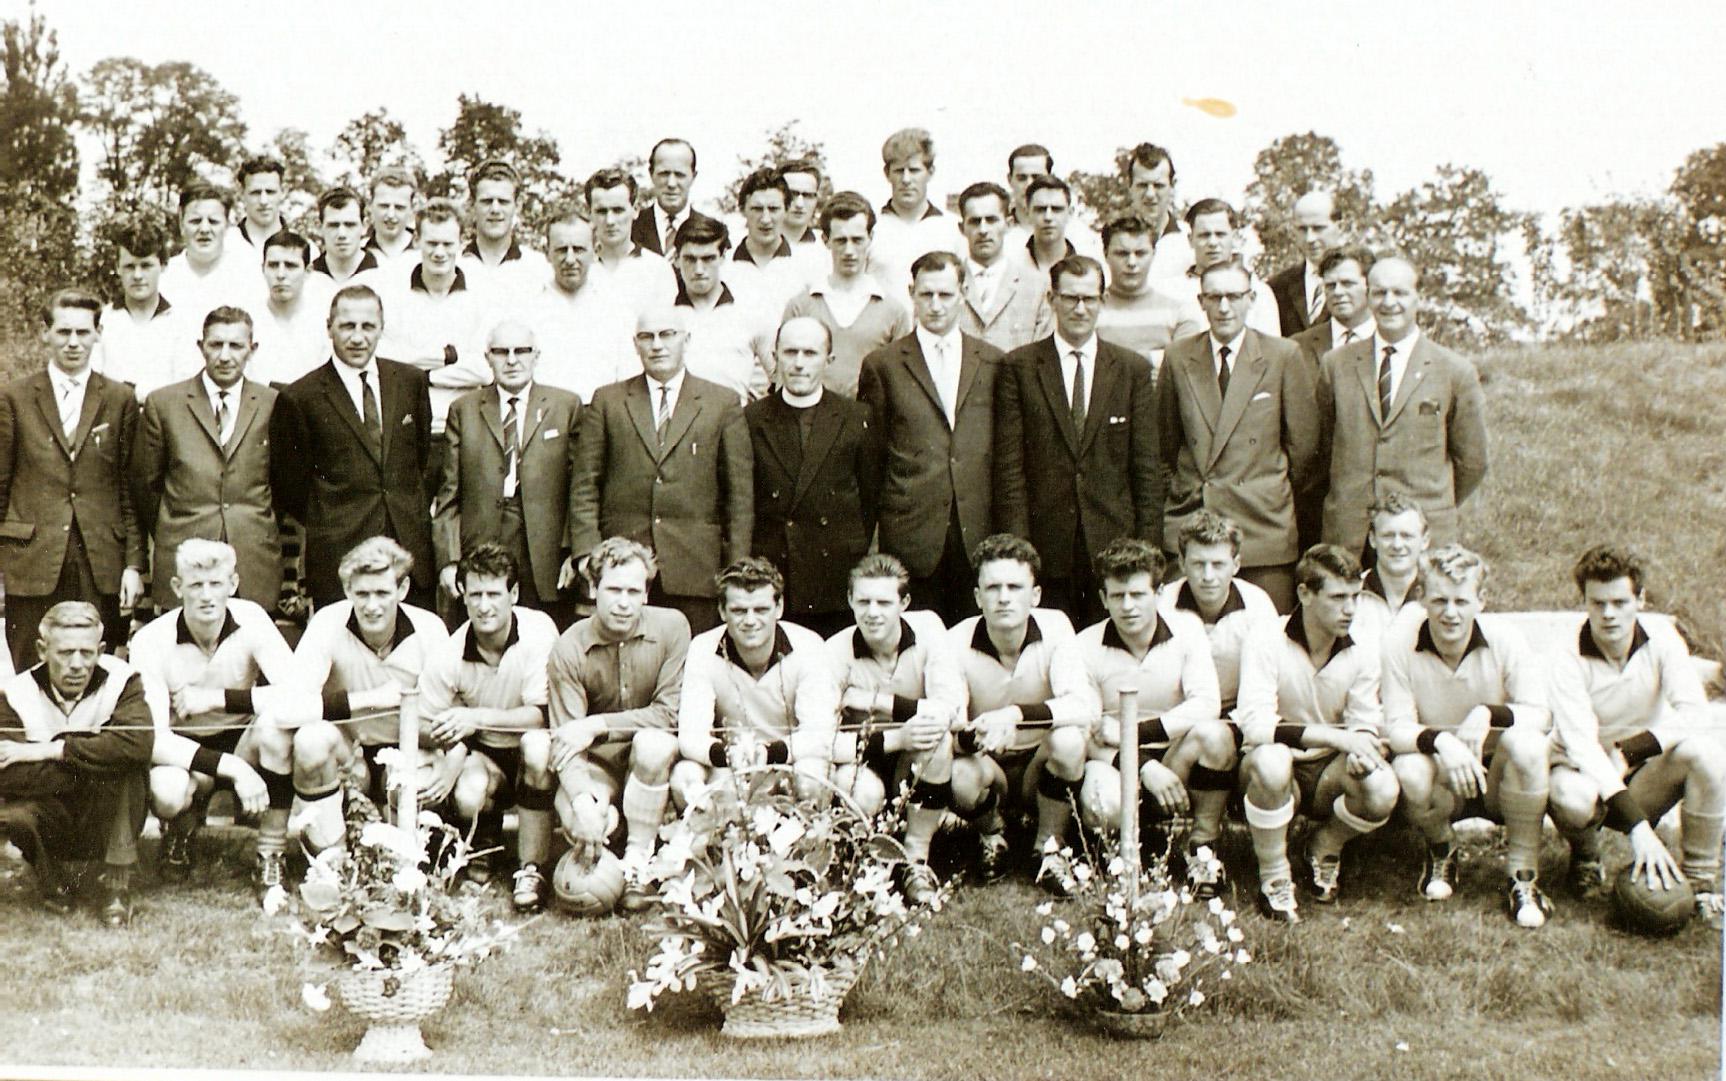 1962 1e - 2e - 3e elftal kampioen voetbalclub RKVV Sint Michielsgestel